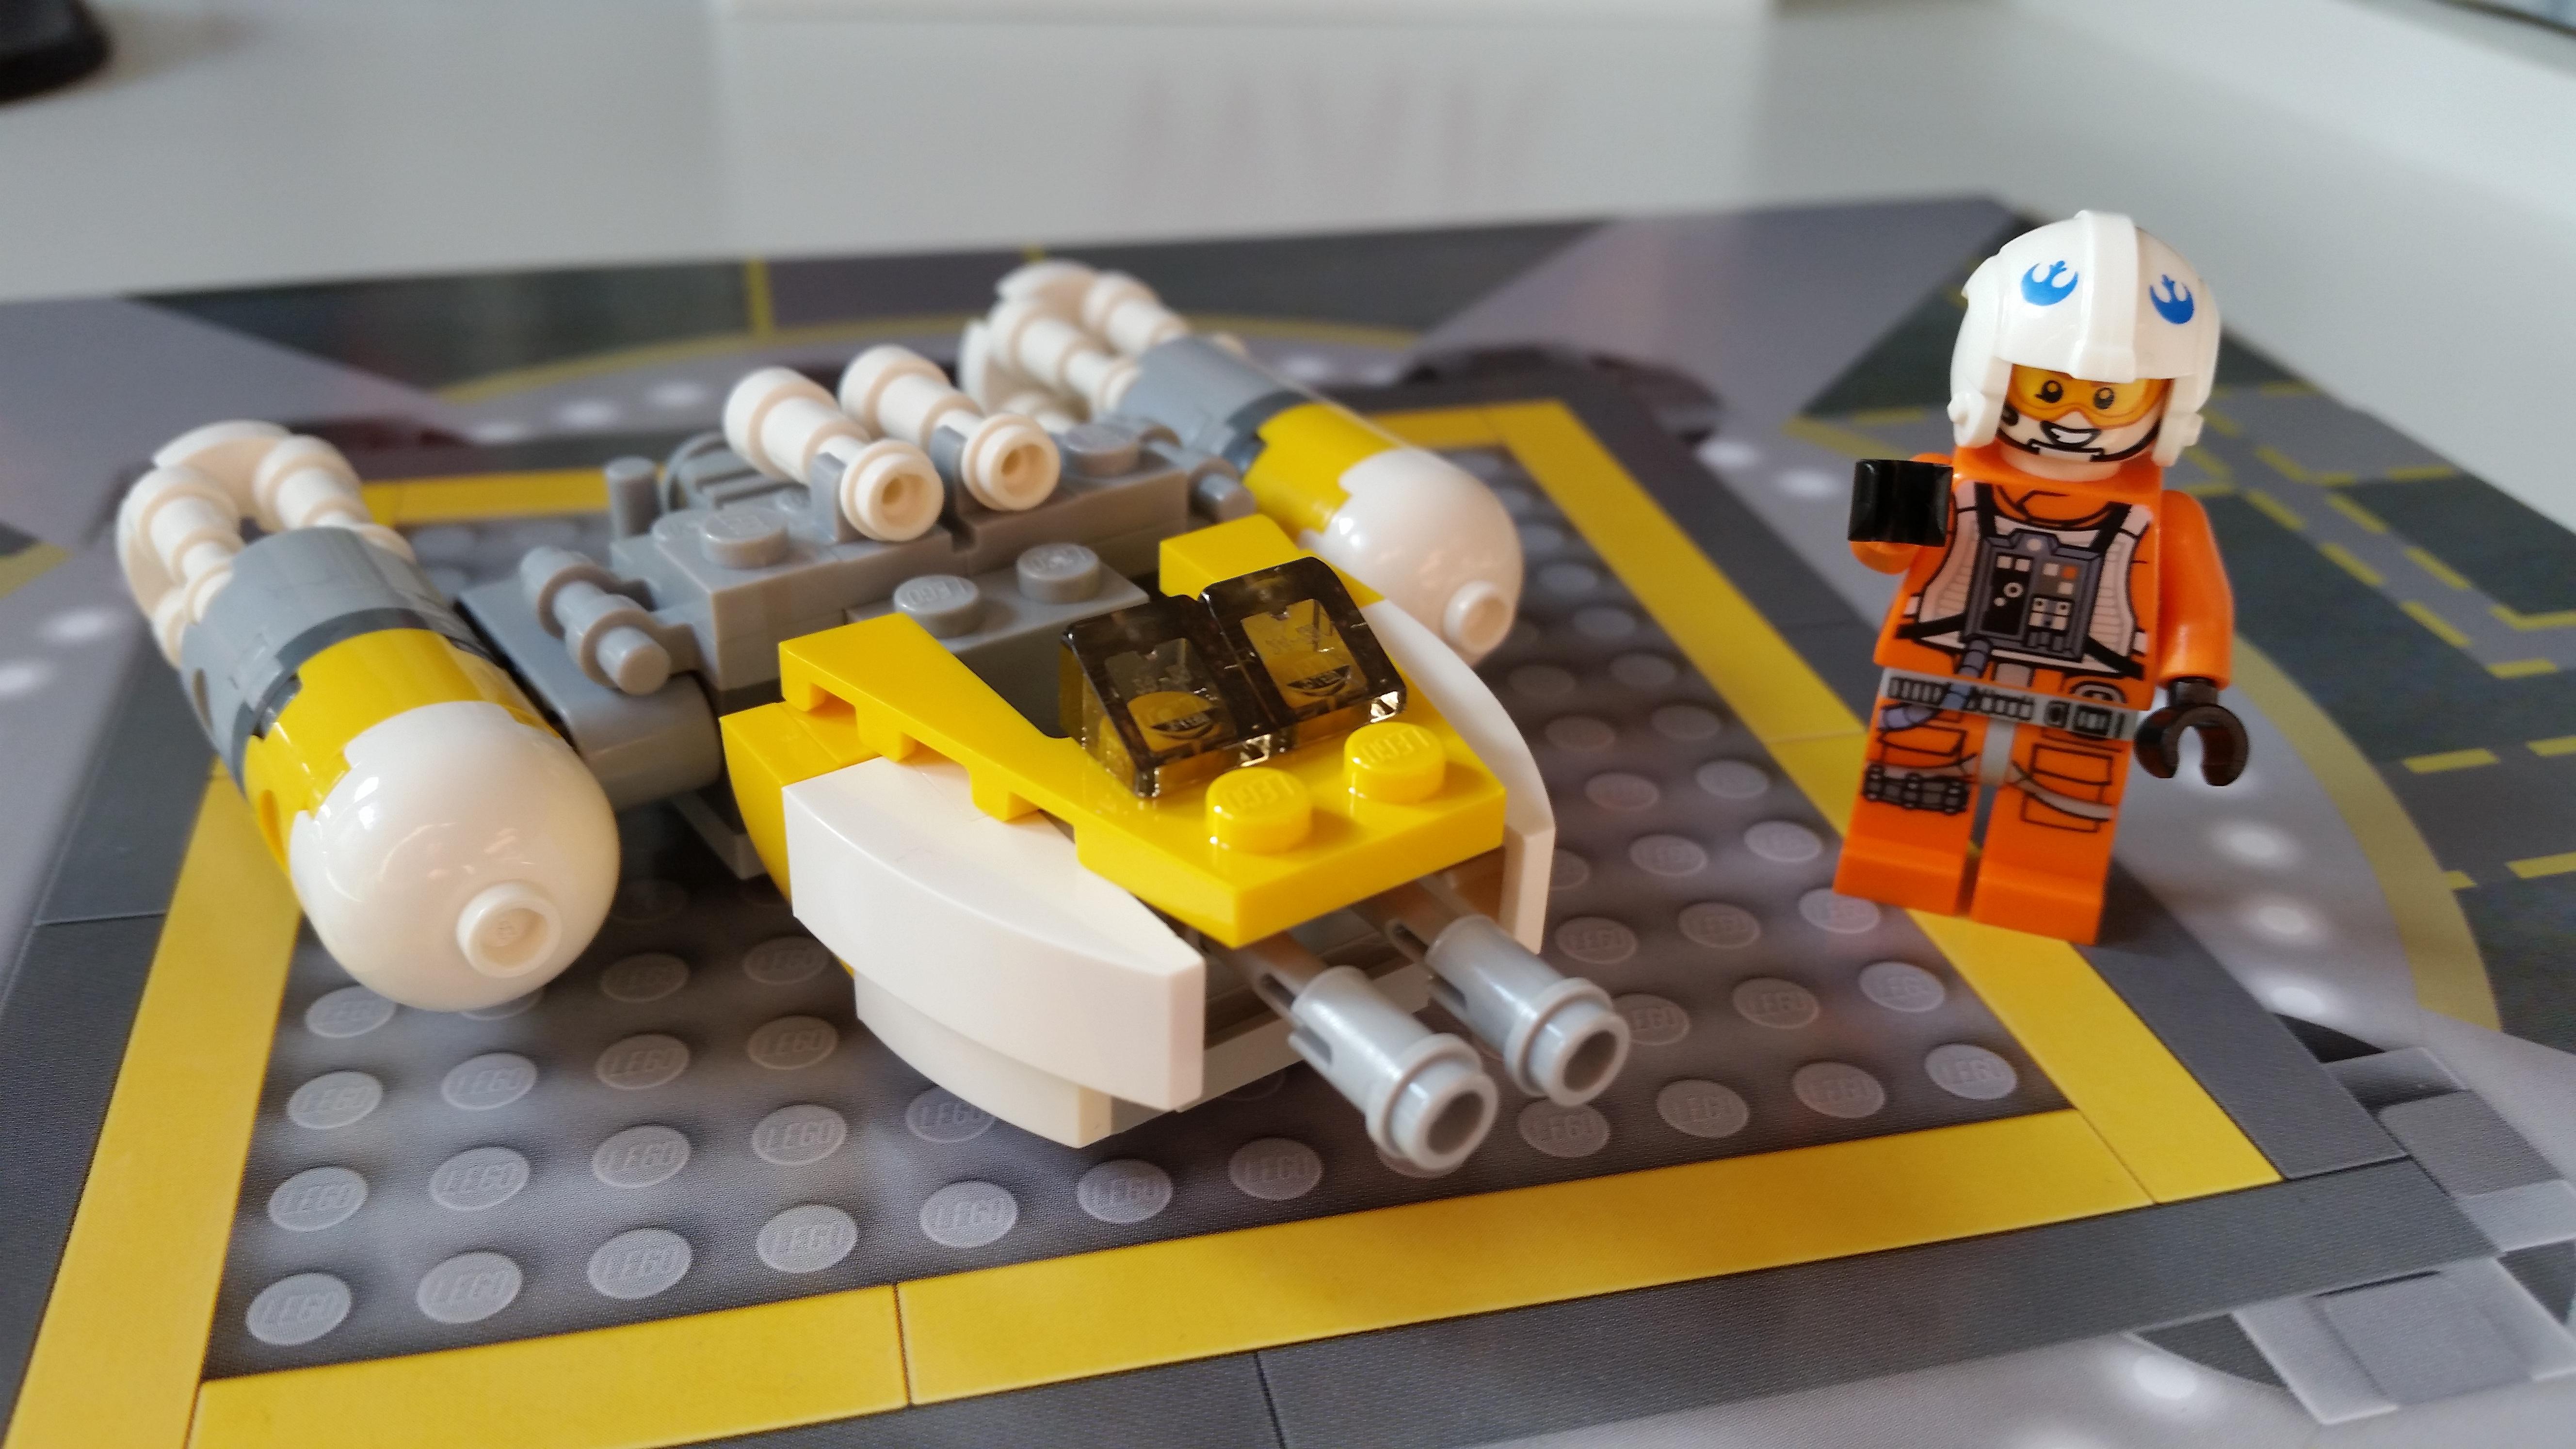 lego star wars selber bauen anleitung good gebraucht lego. Black Bedroom Furniture Sets. Home Design Ideas